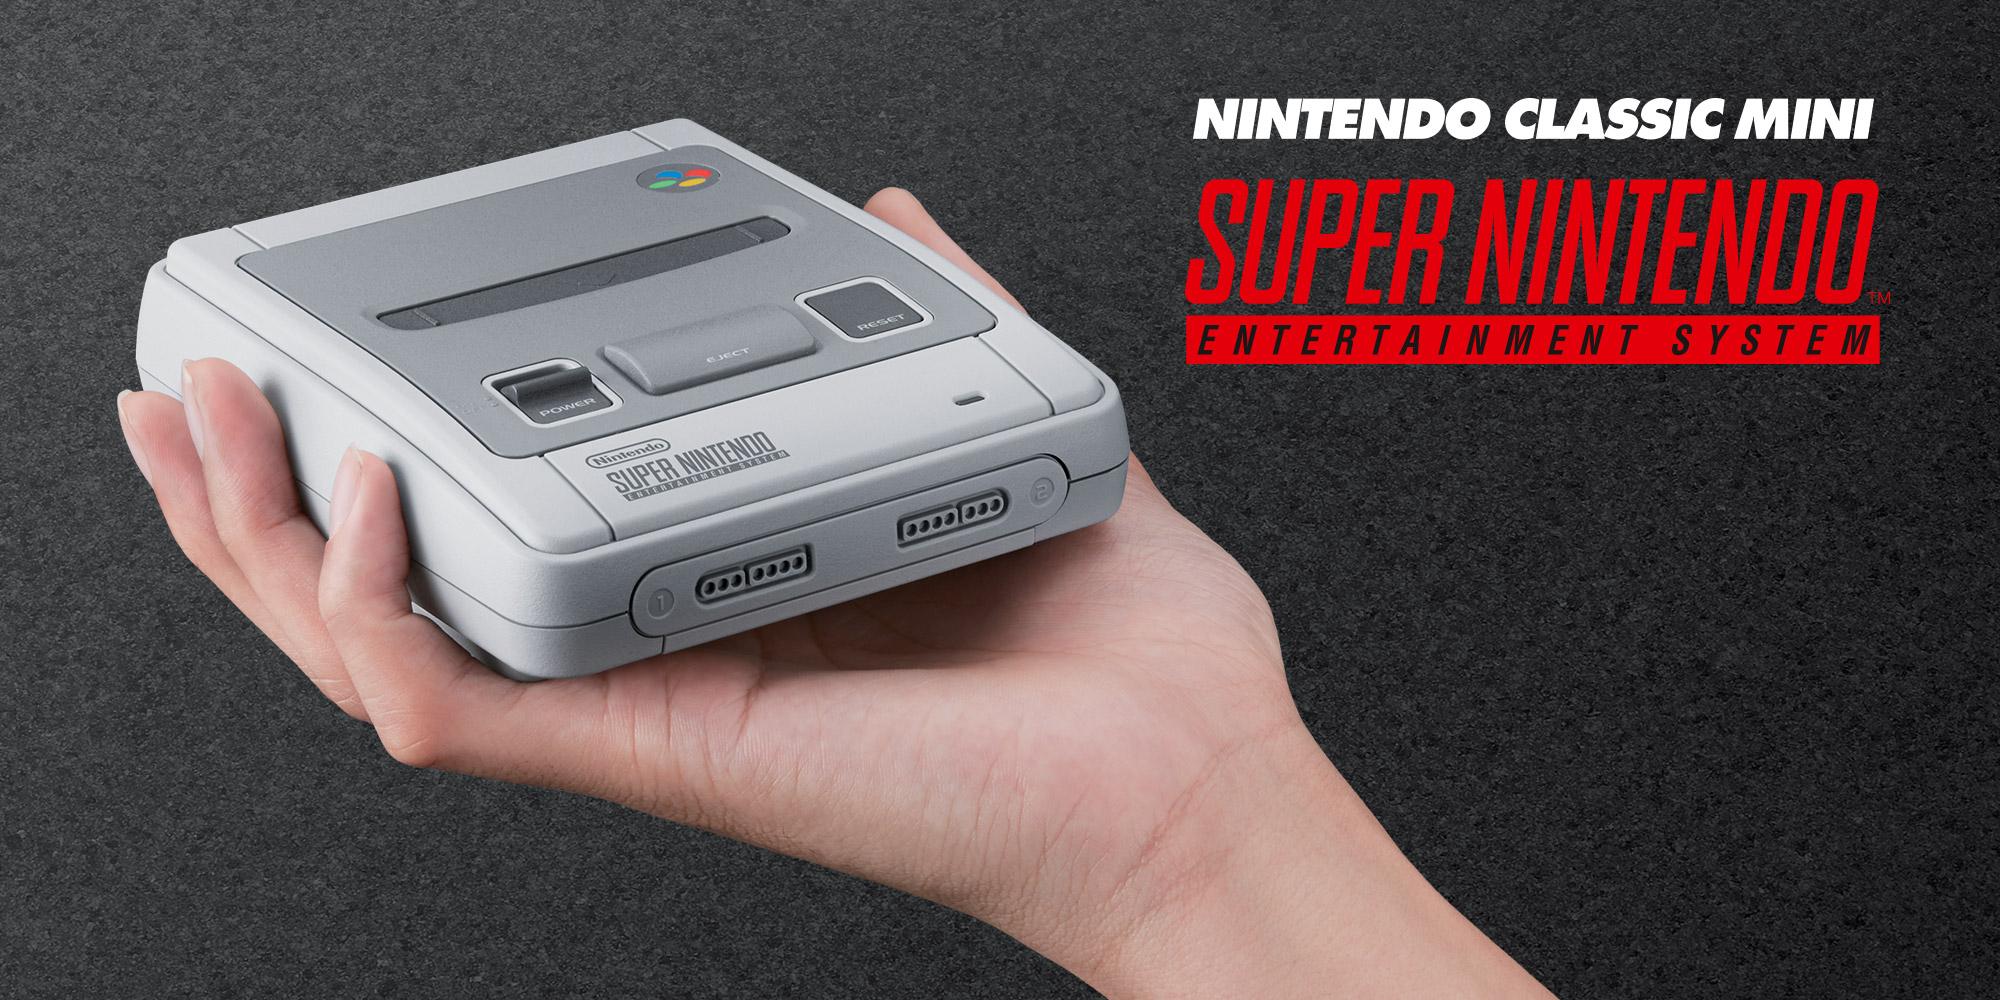 Super Nintendo Classic Mini H2x1_NintendoClassicMiniSNES-pc-games